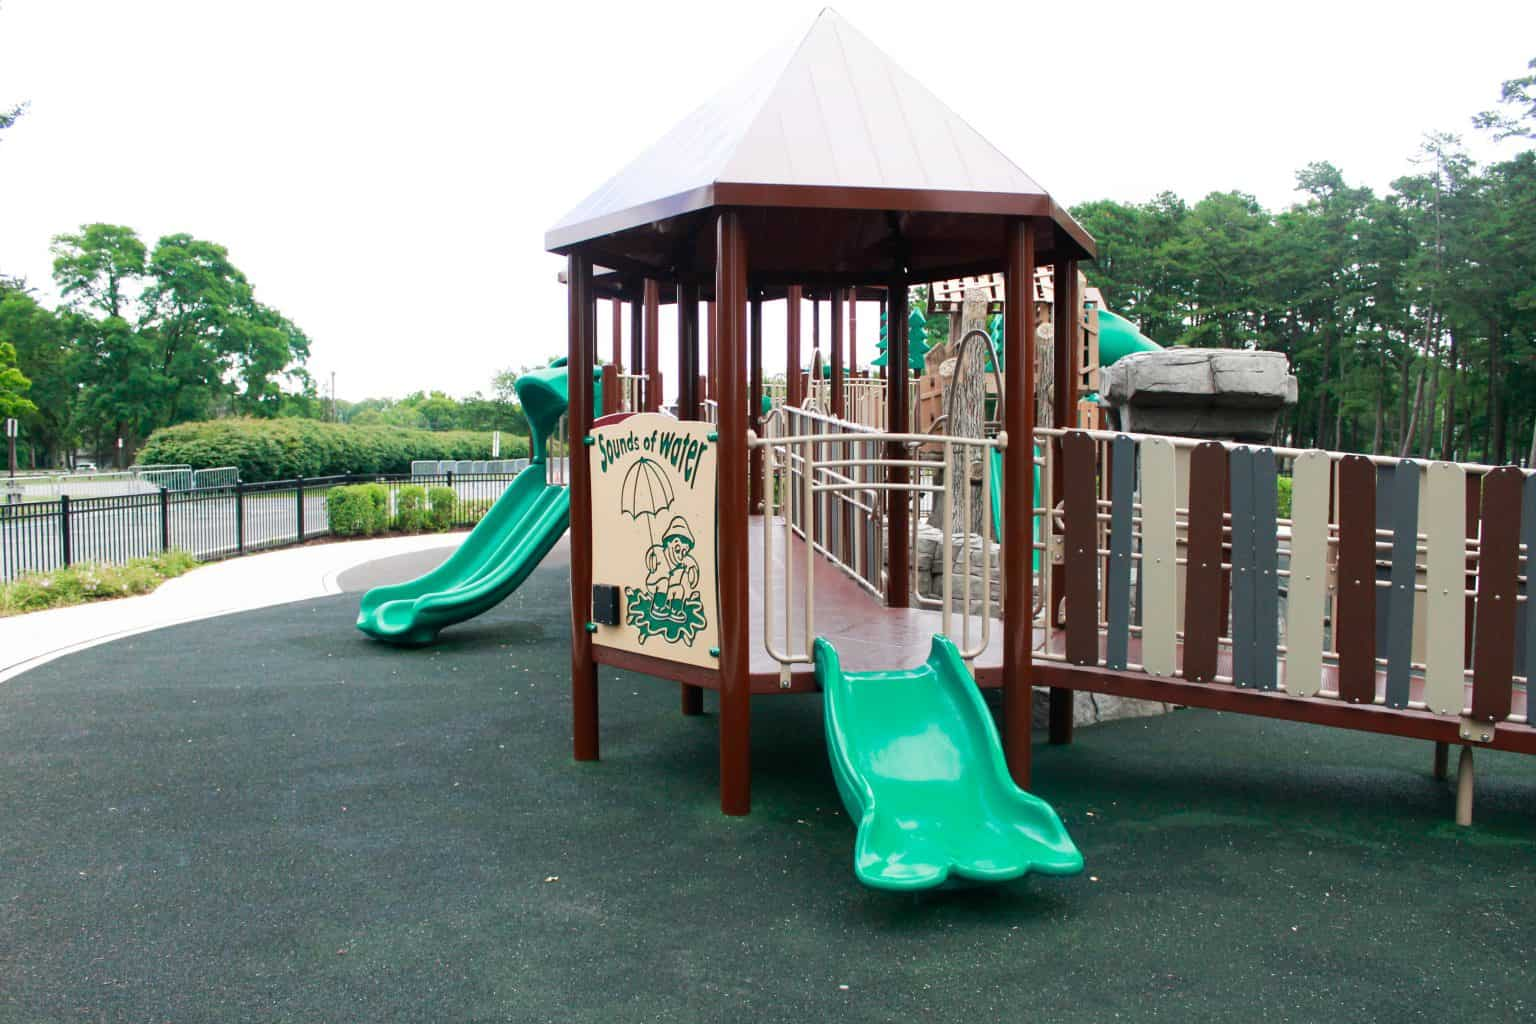 windward-beach-park-playground-brick-nj_28266703635_o-1536x1024